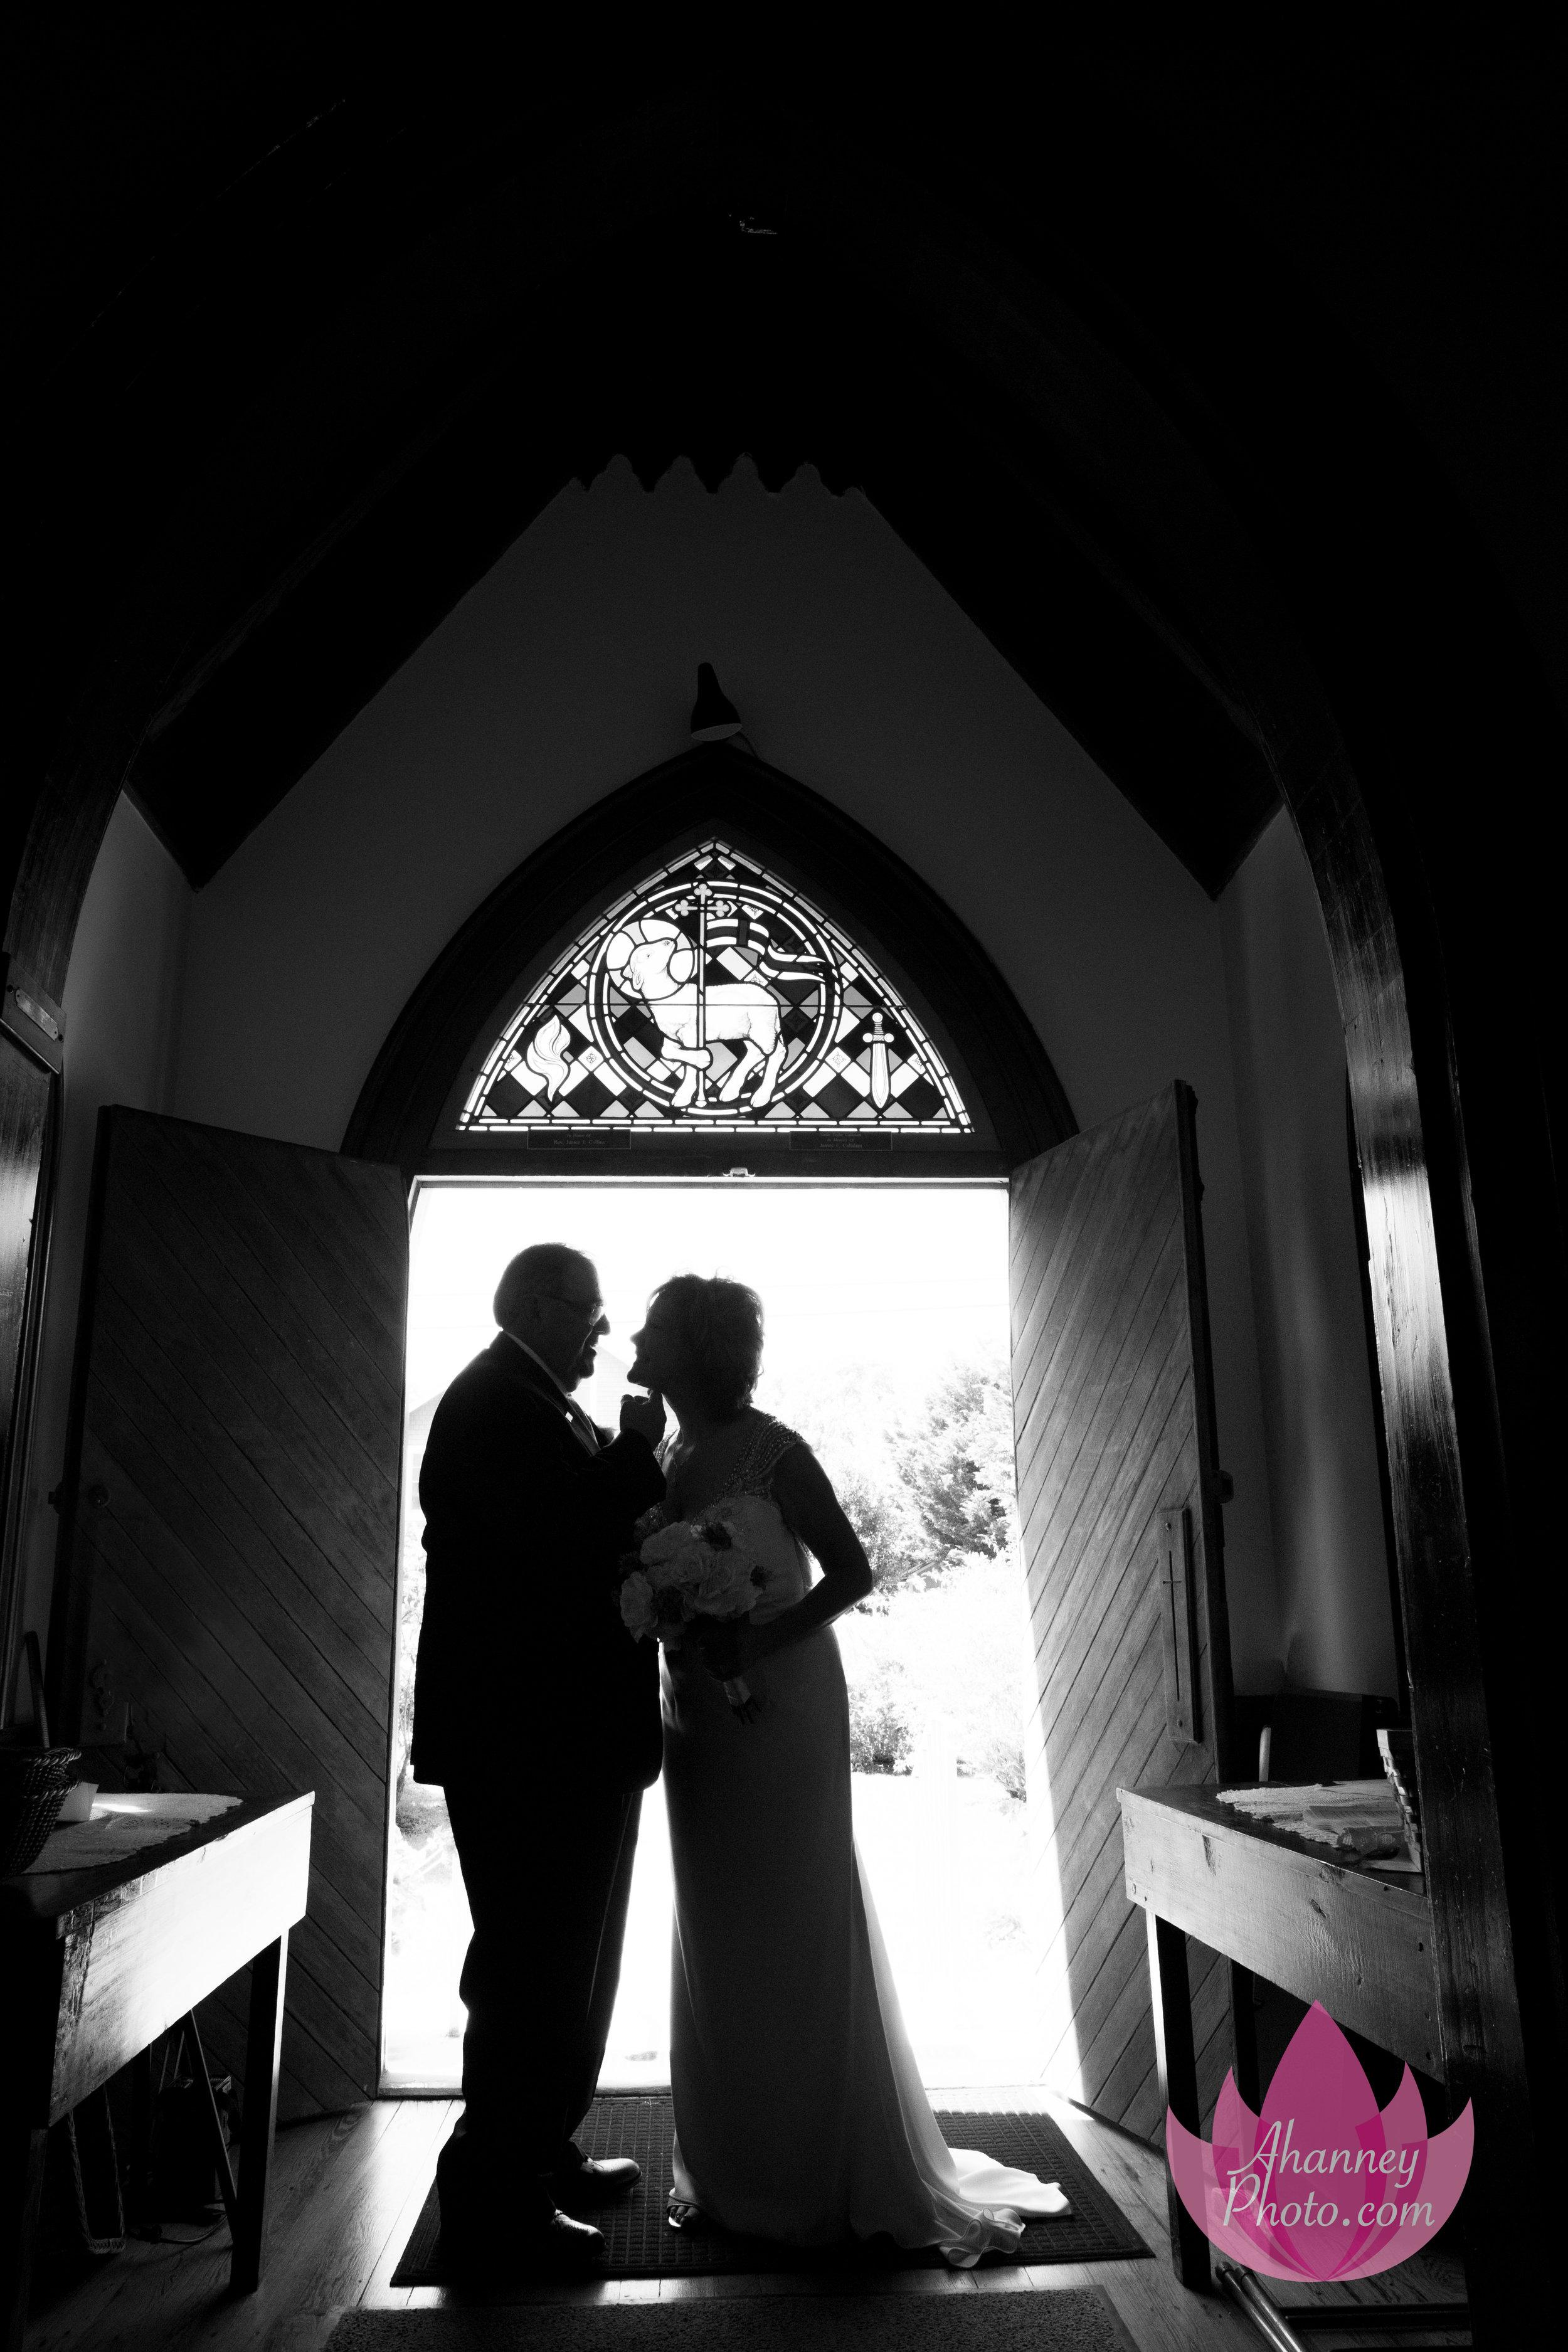 Wedding Groom Bride Doorway ChurchThe Grand Hotel Cape May New Jersey Philadelphia Delaware Anastasia Hanney Photography AHanneyPhoto